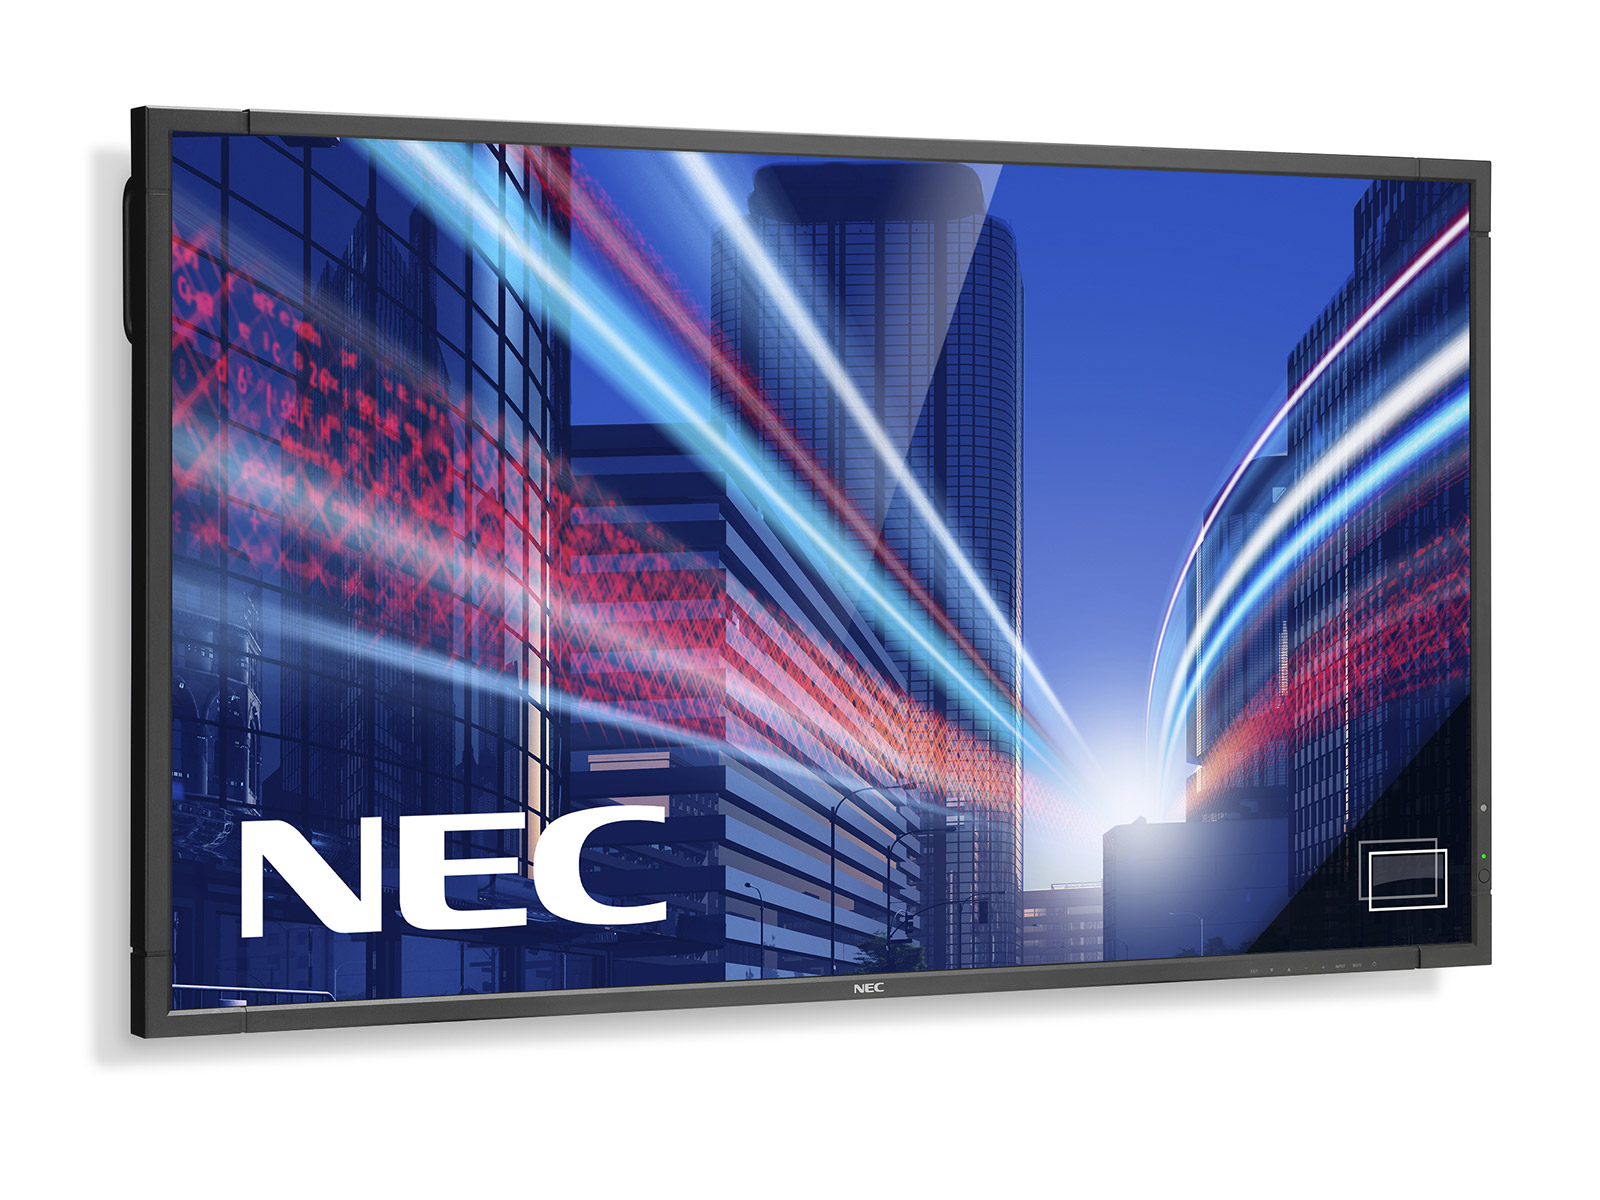 P801PG-DisplayViewRightBlack-NEC